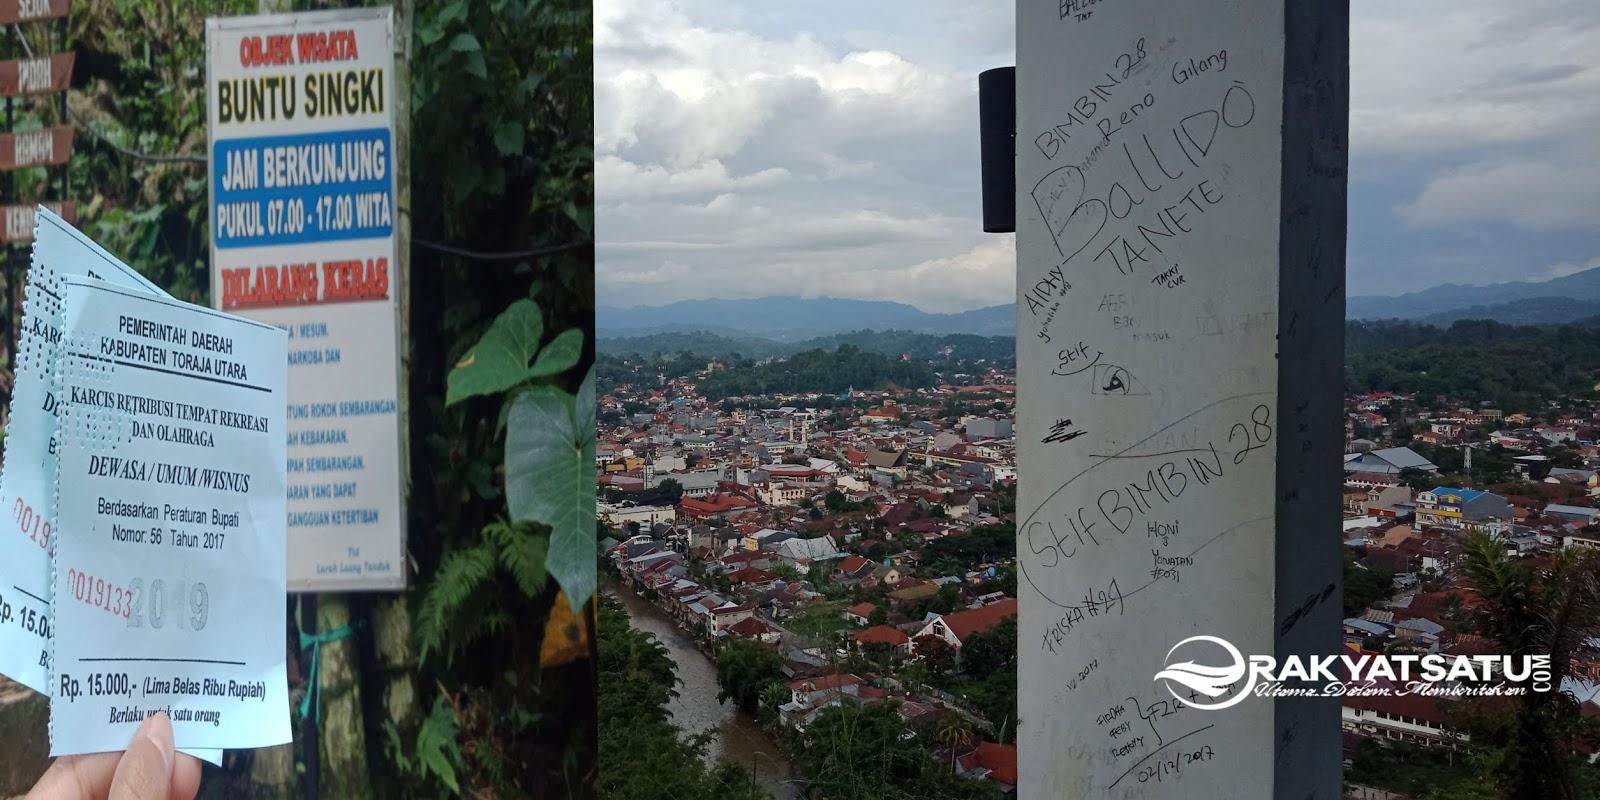 Tarik Retribusi 15 ribu, Begini Penampakan Objek Wisata Buntu Singki' Toraja Utara